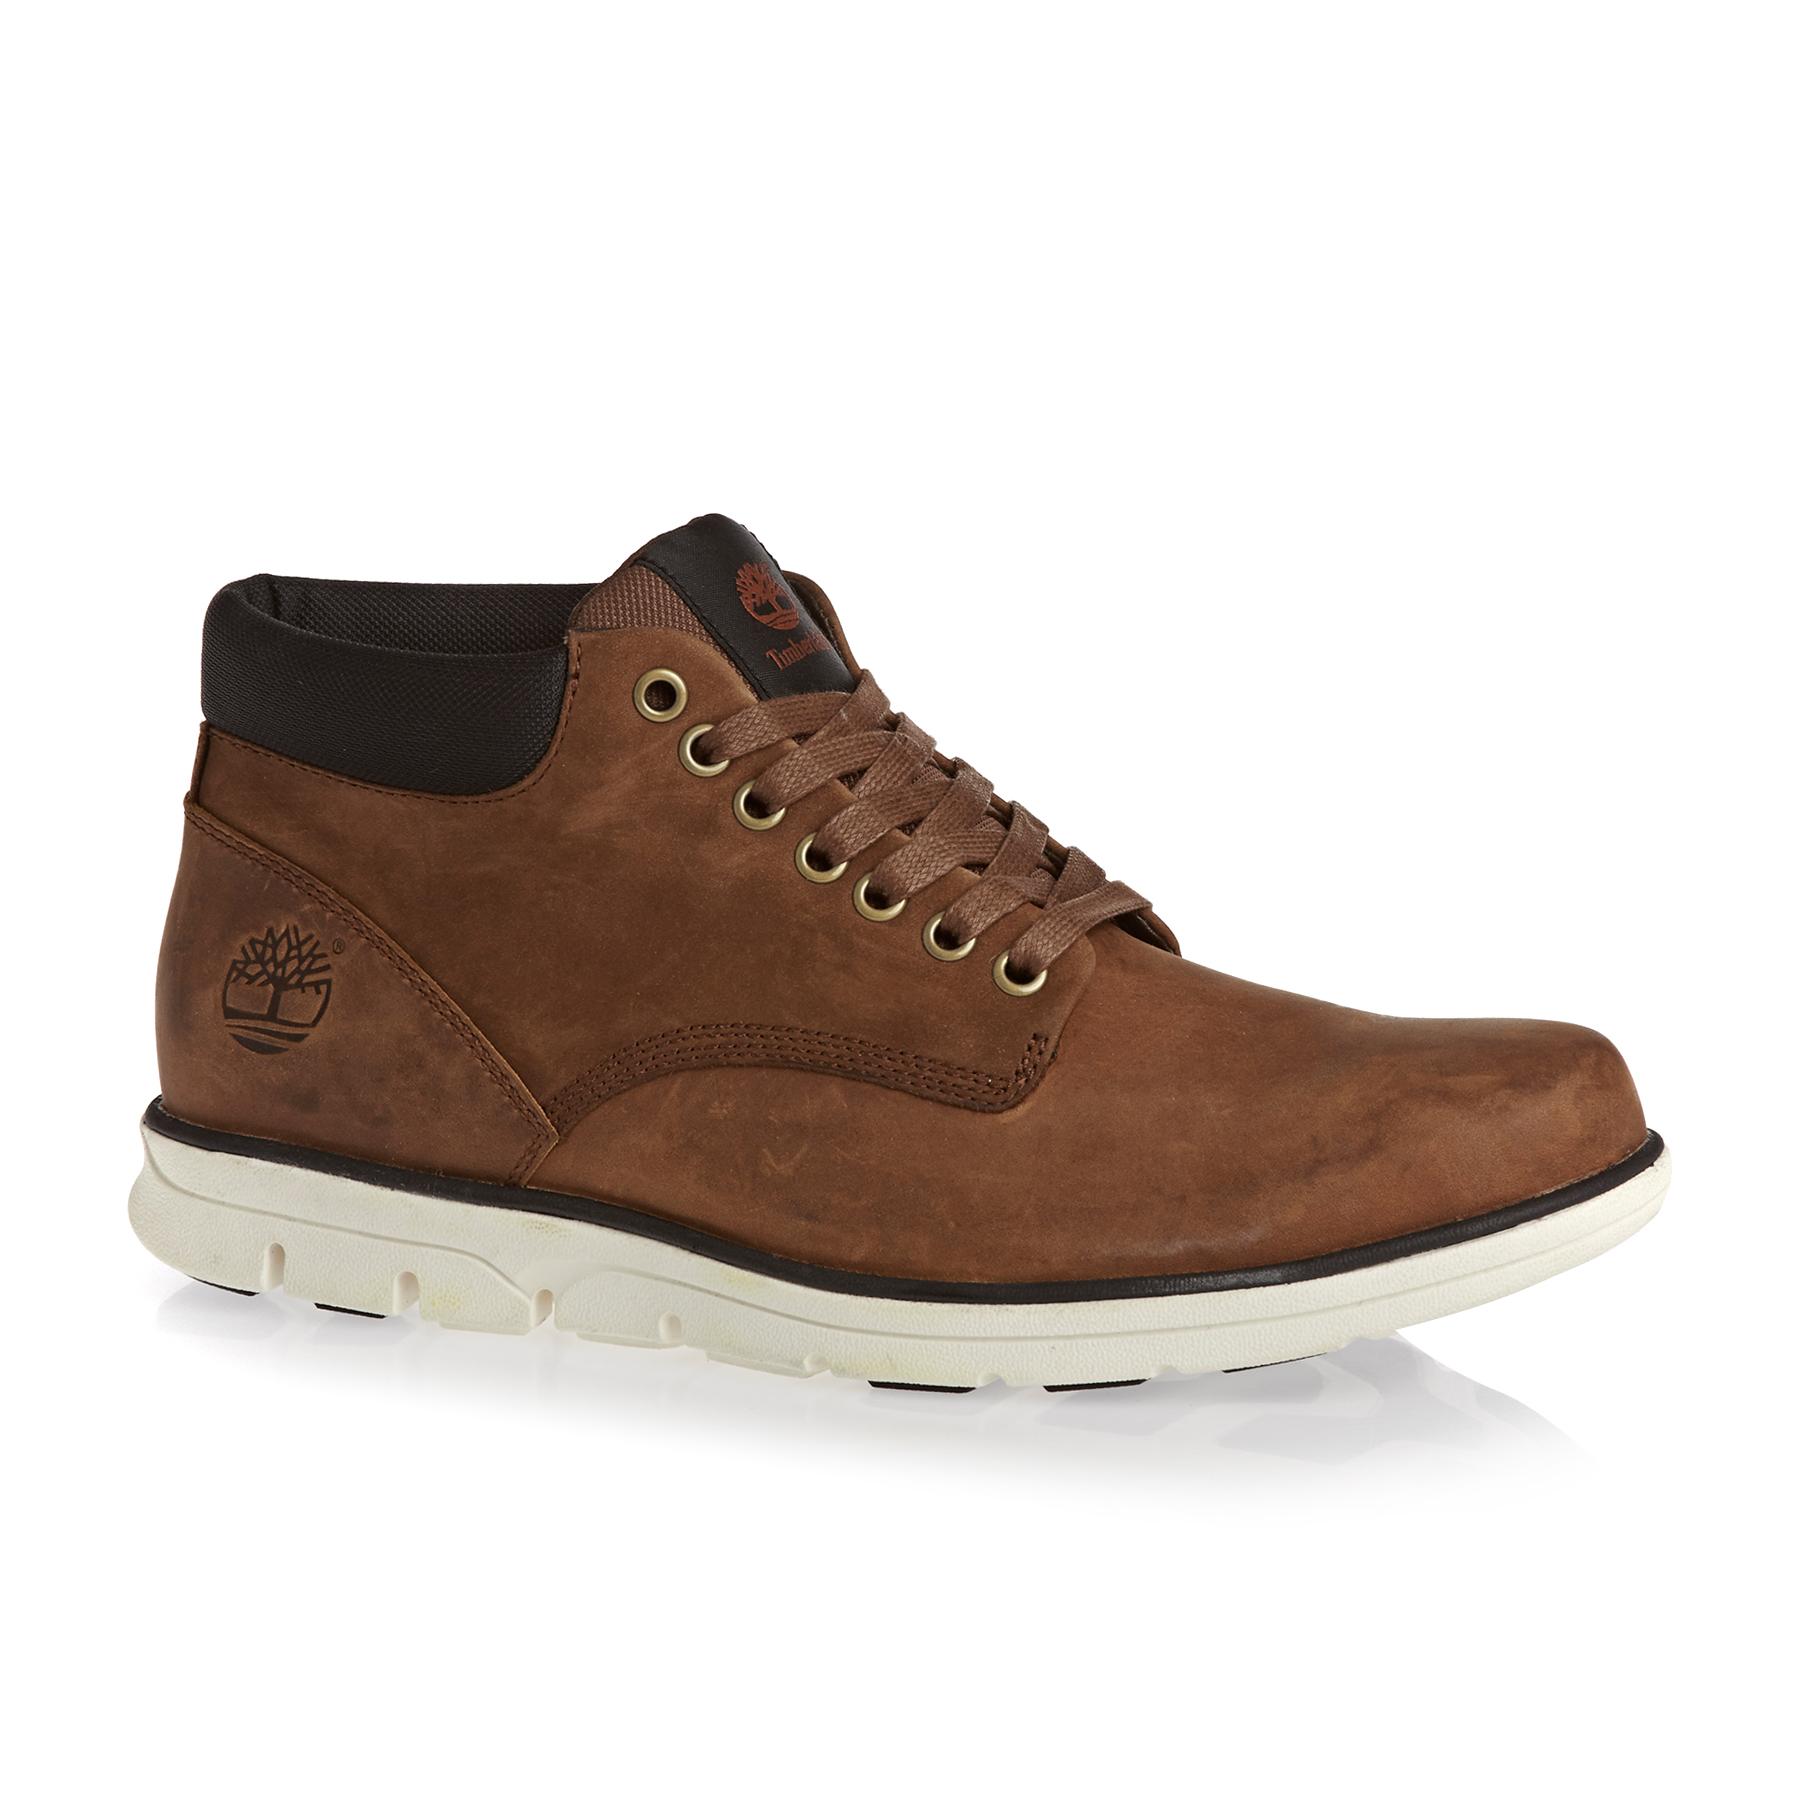 Timberland Bradstreet Chukka Men's Boots Brown   Country Attire